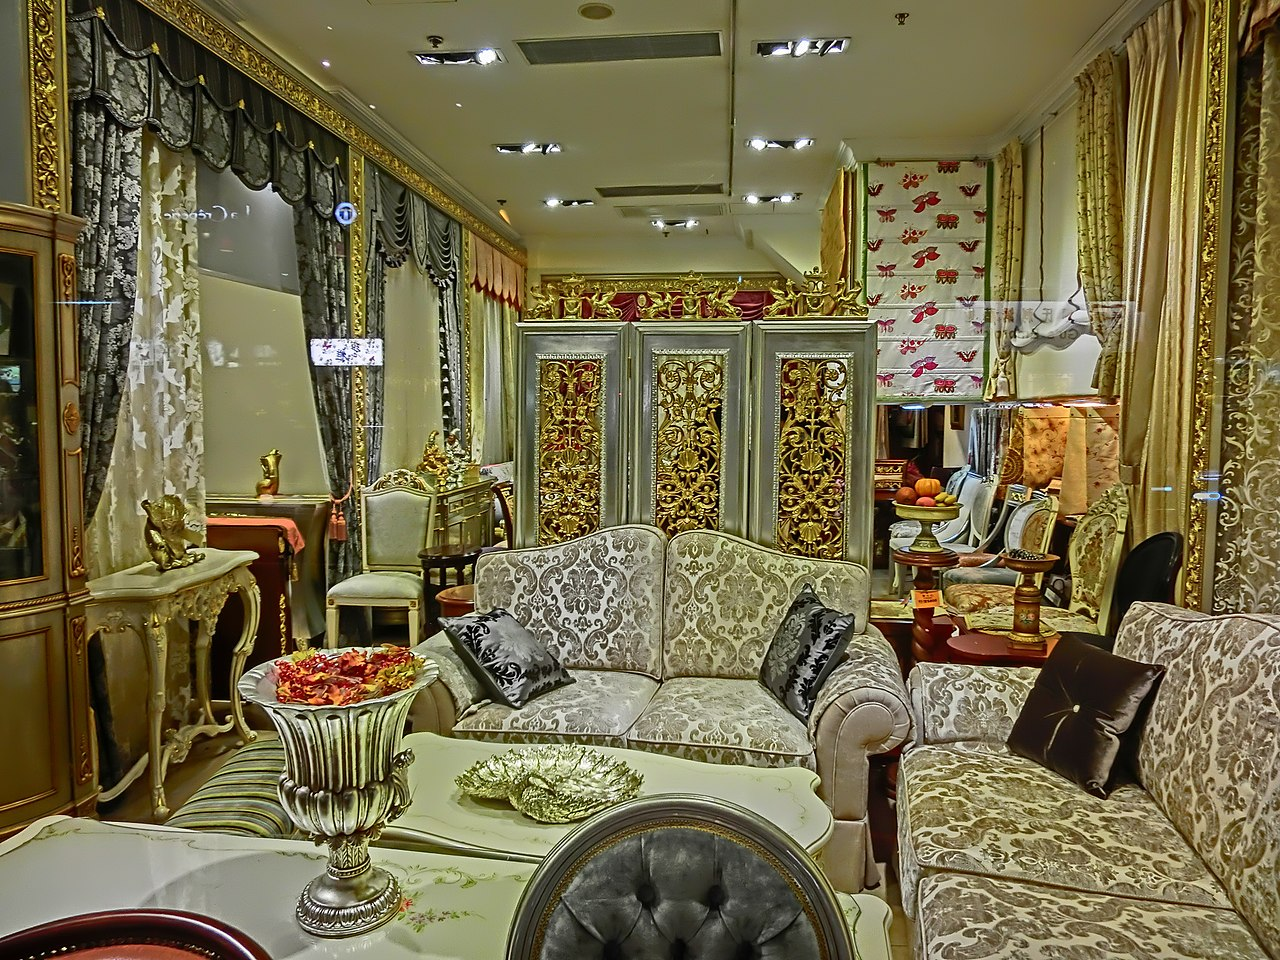 Lovely File:HK Wan Chai Queenu0027s Road East Night Furniture Shop Apr 2013.JPG